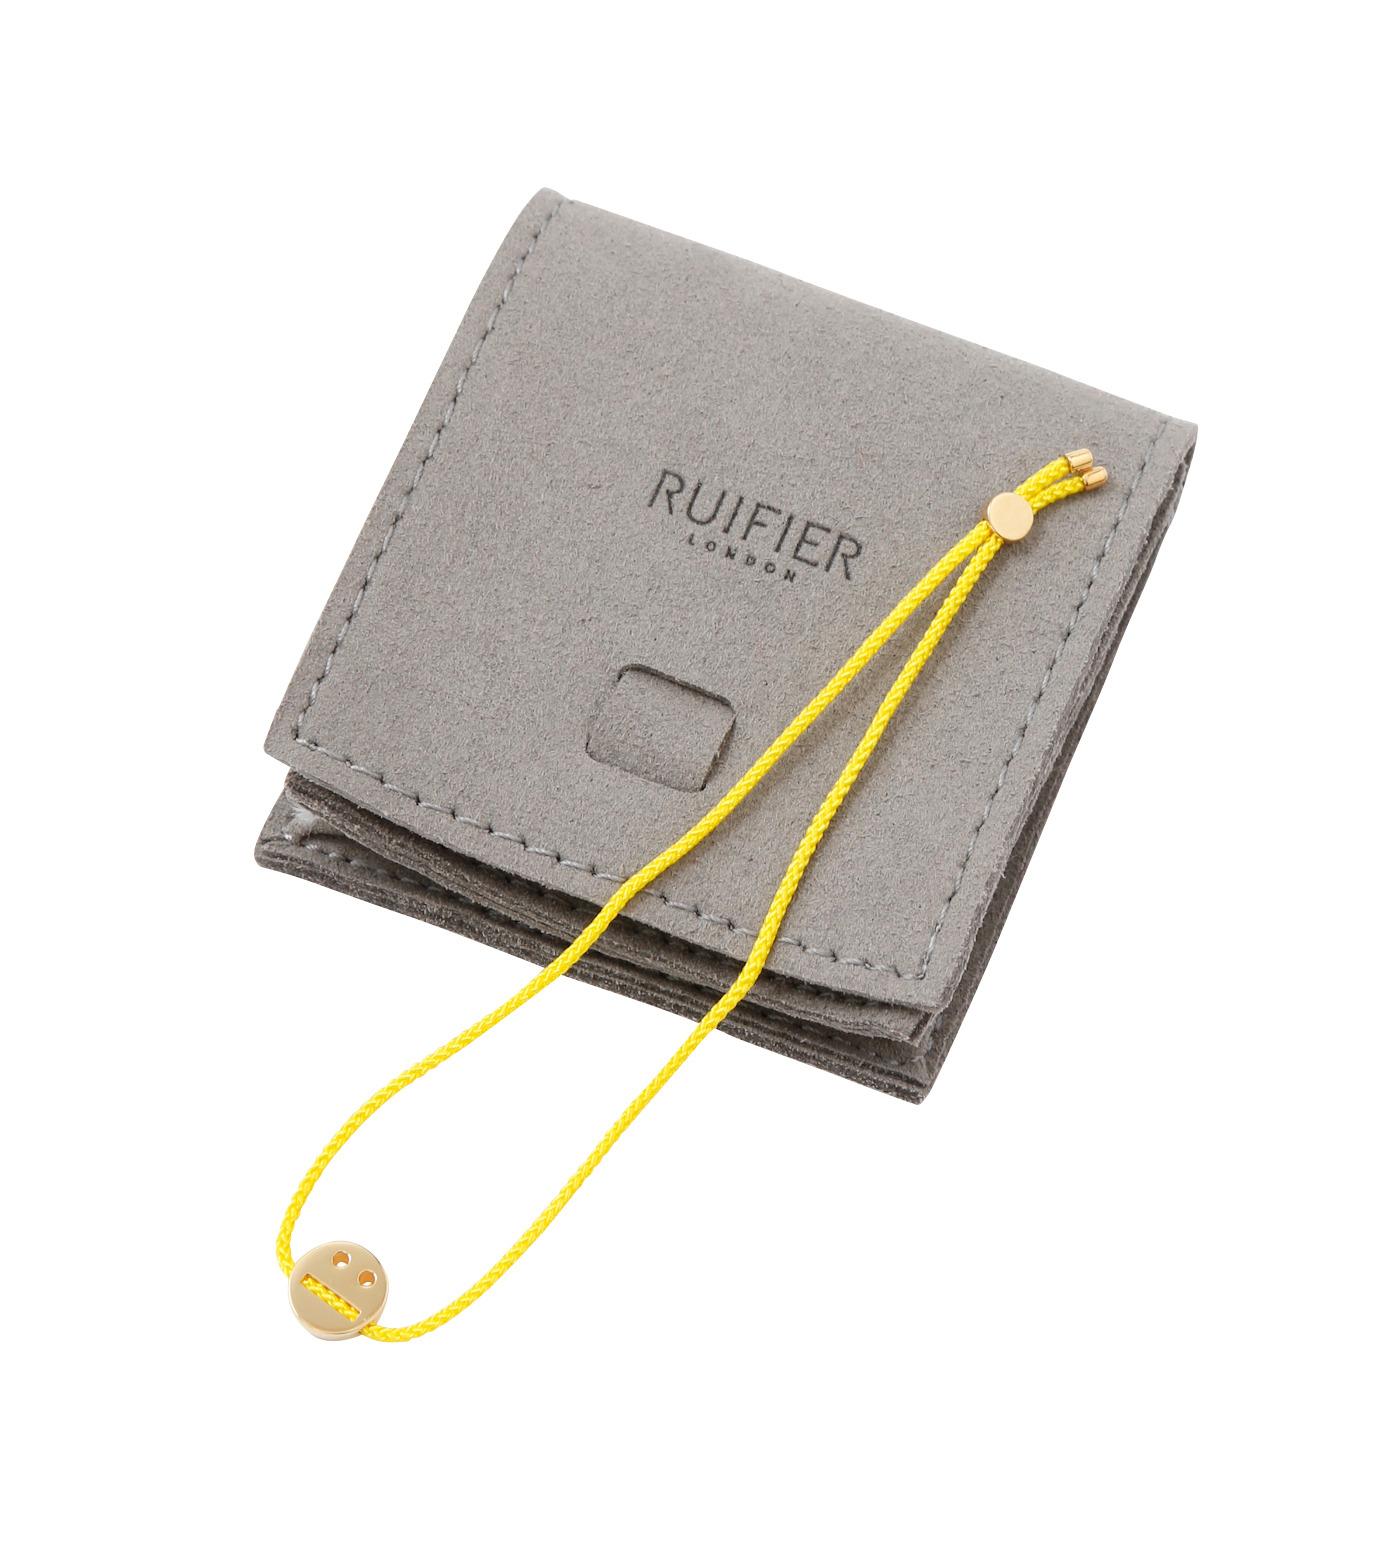 RUIFIER(ルイフフェラ)のFriends Bracelet Gold-YELLOW(ブレスレット/bracelet)-BVE56VB0L-32 拡大詳細画像3